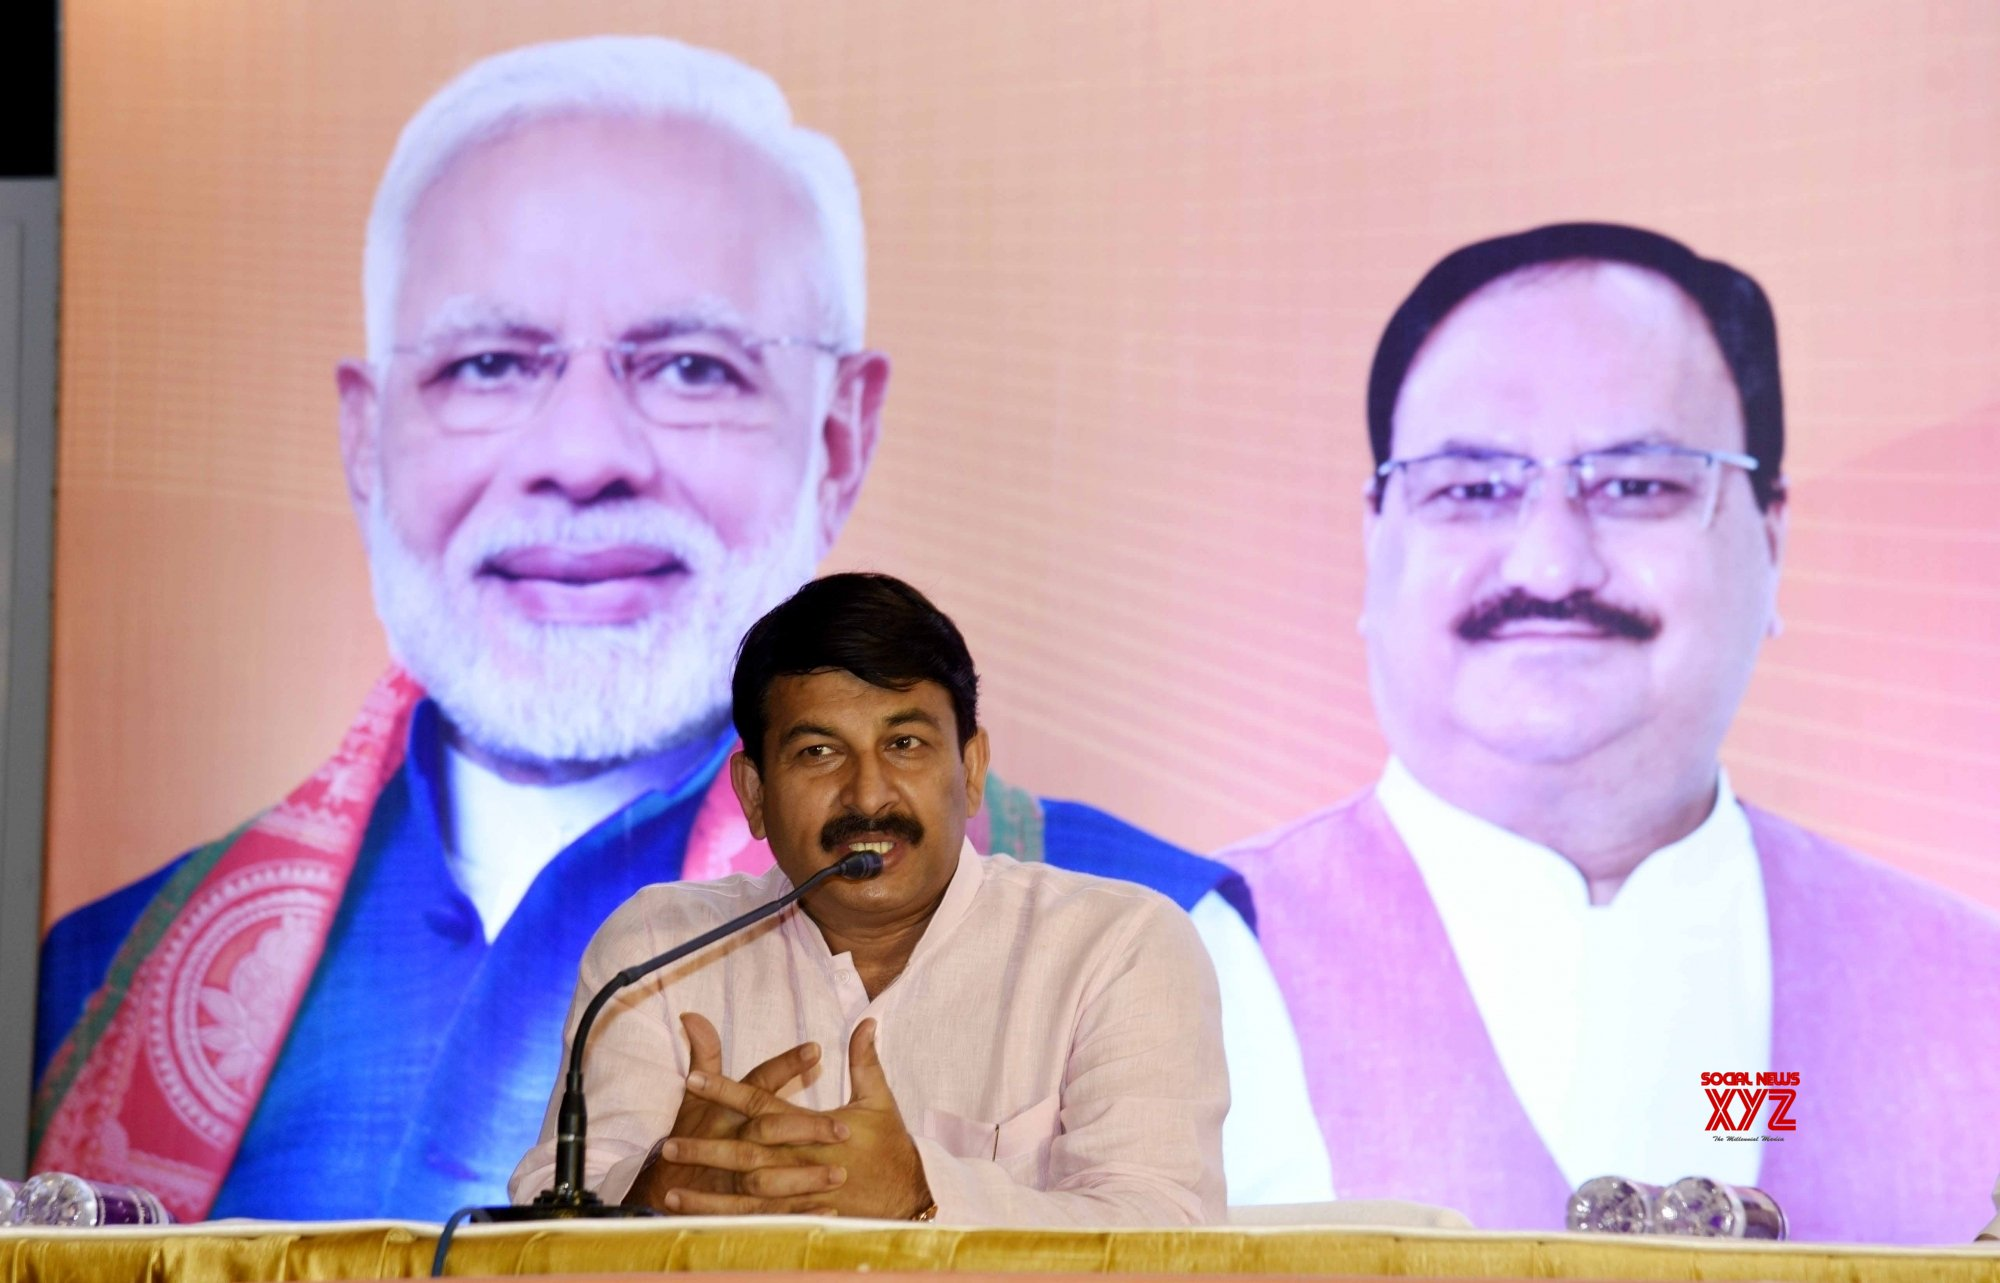 Manoj Tiwari starts election campaign of BJP in Bihar